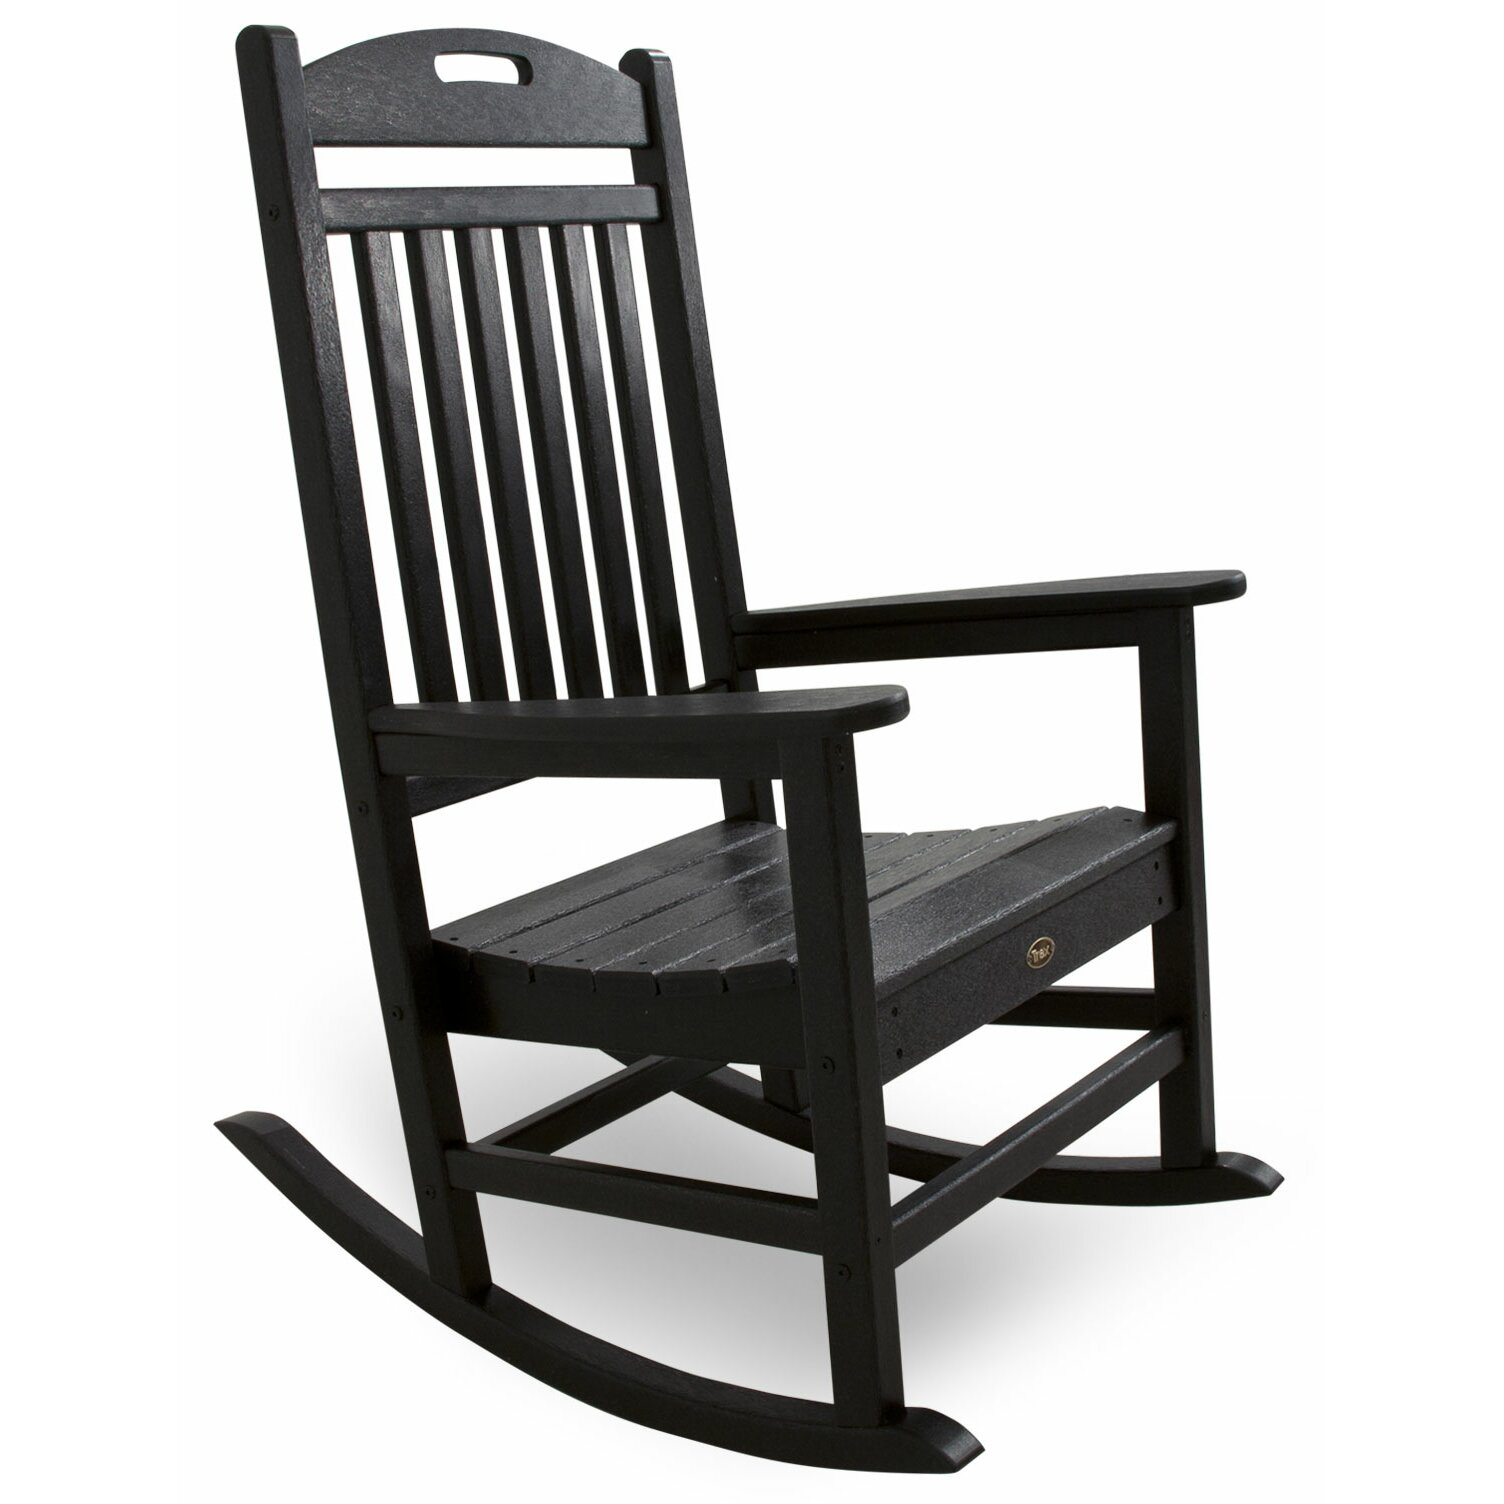 Polywood yacht club rocking chair reviews wayfair - Rocking chair de jardin ...